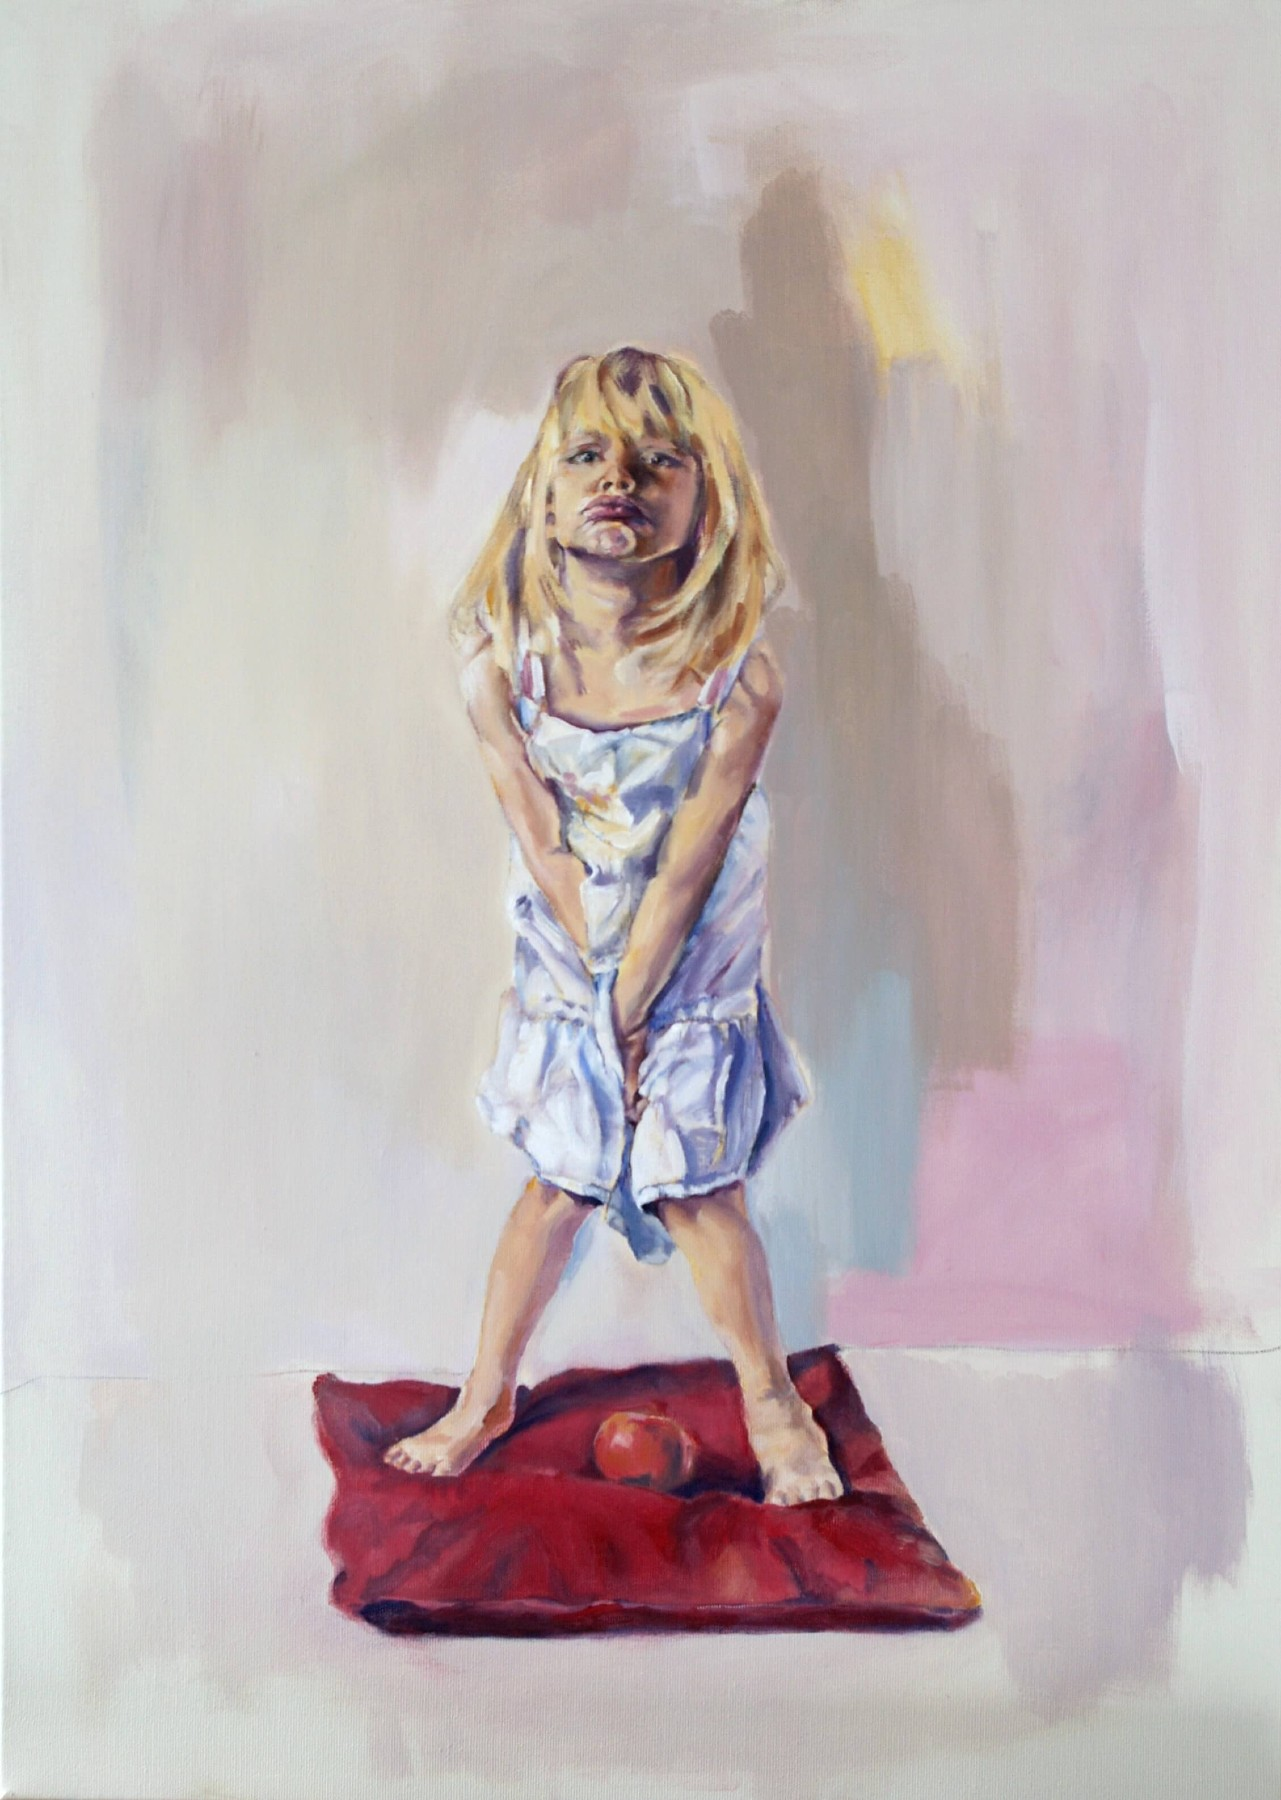 Leda on a Pillow - painting, acrylic on canvas by artist Neva Bergemann